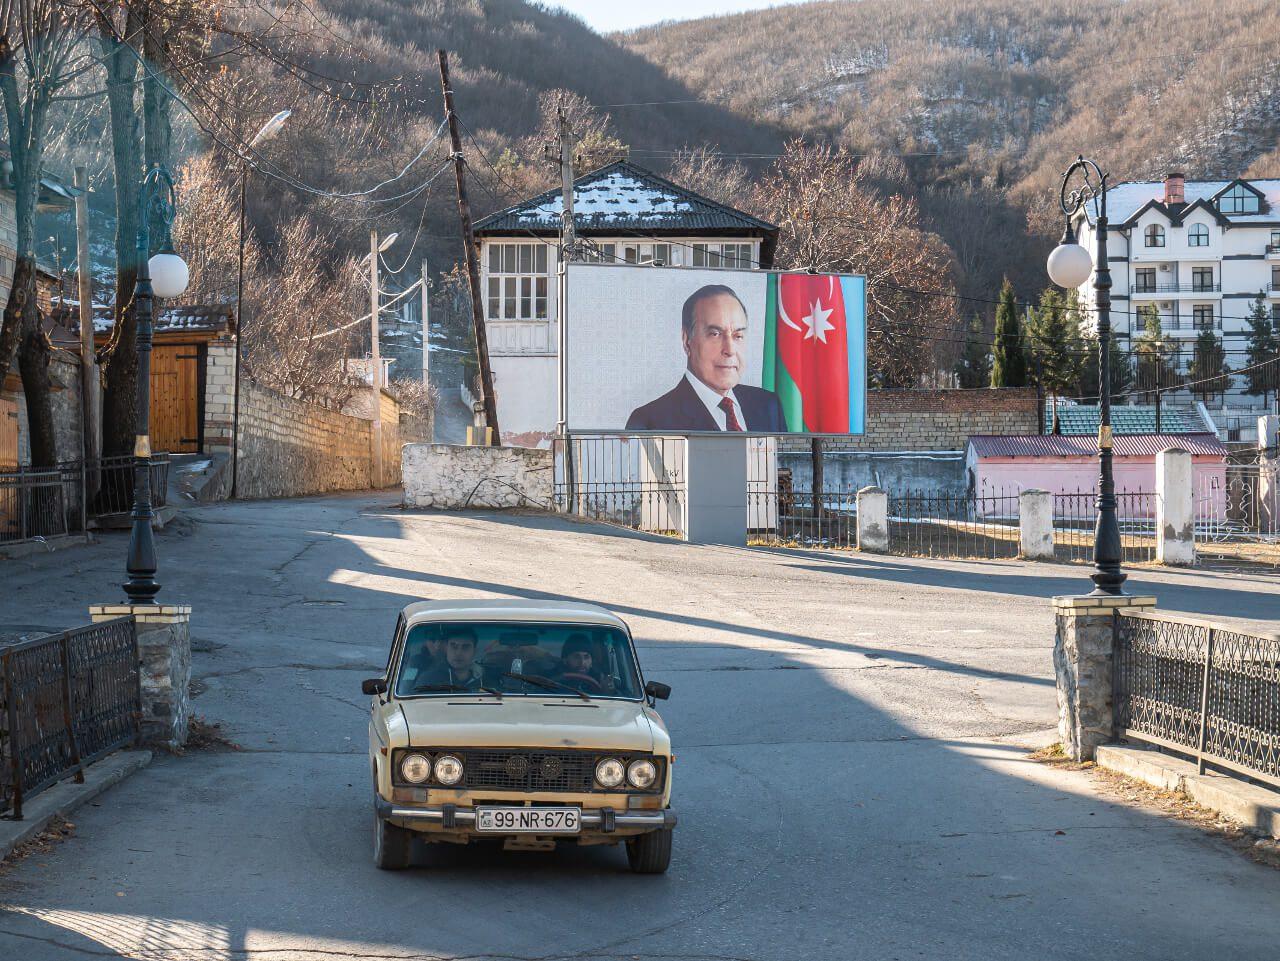 Heydar Aliyev Azerbejdżan ulica